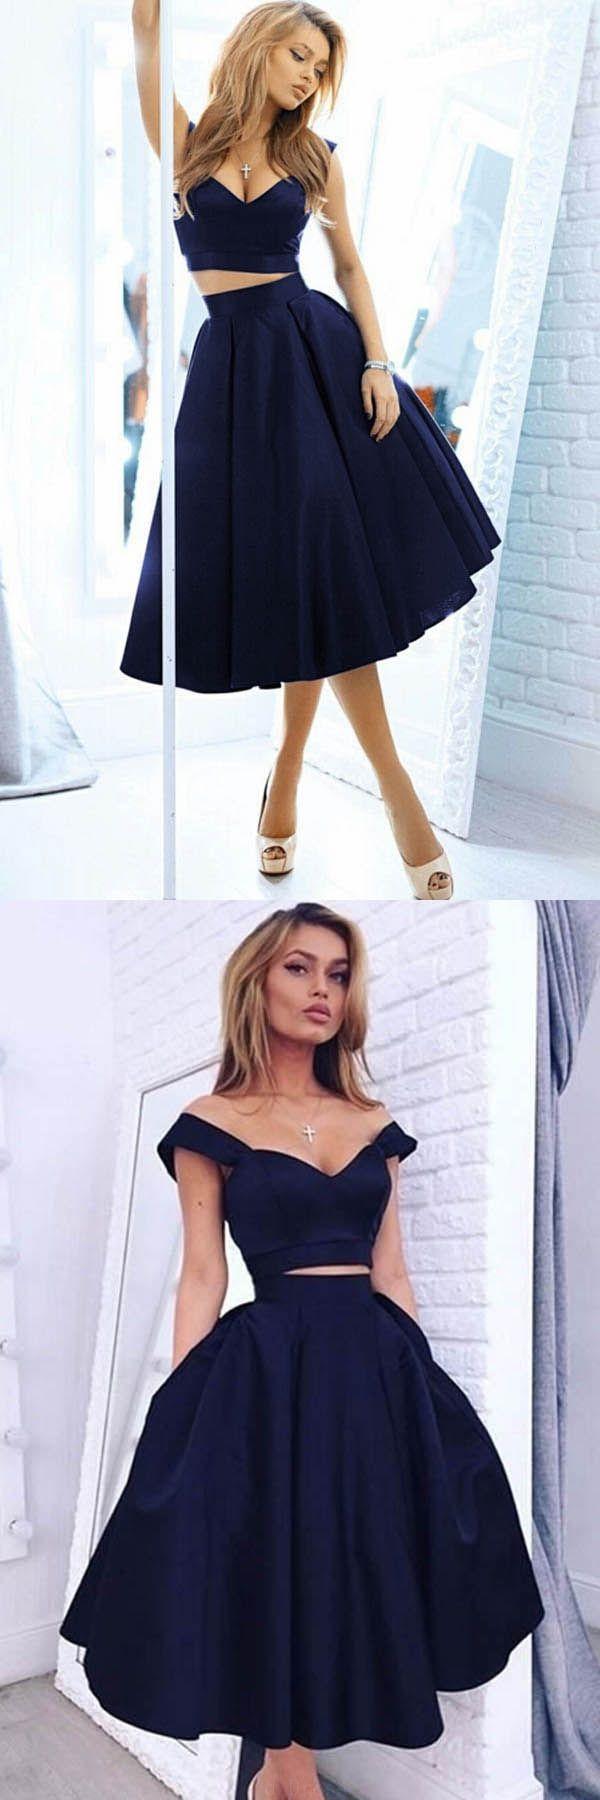 prom dresses promdresses prom dresses short